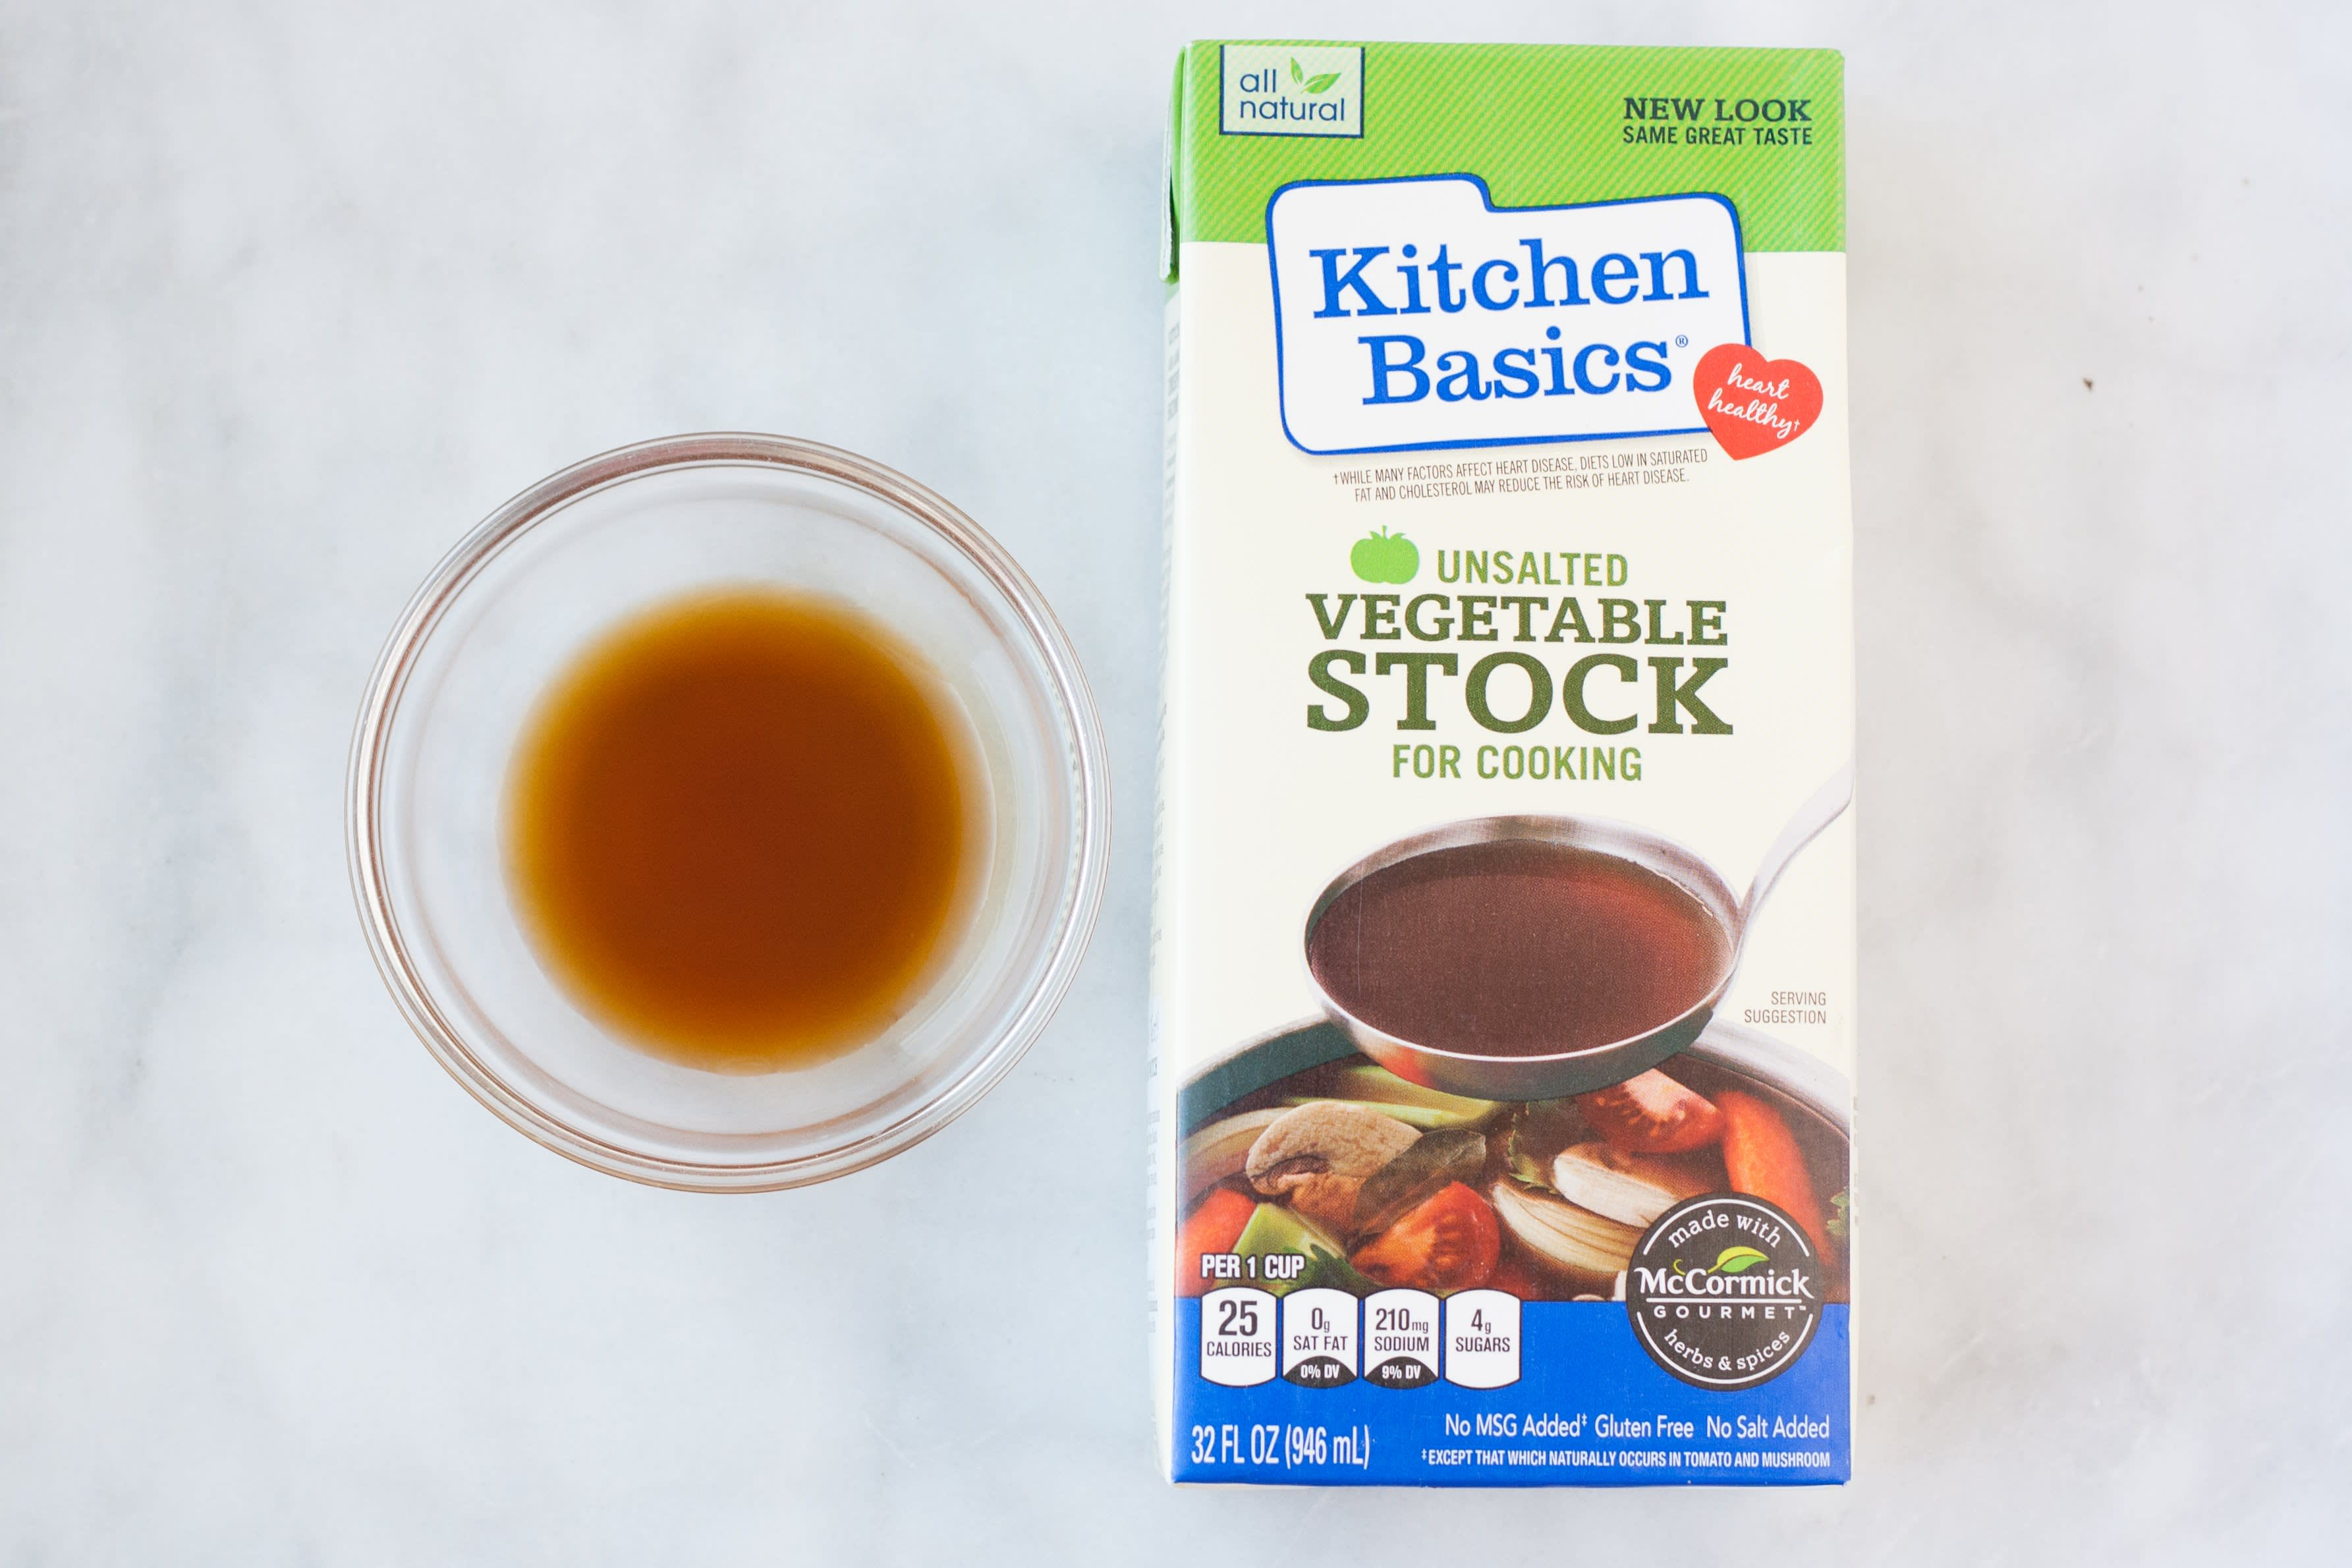 Kitchen Basics Vegetable Stock